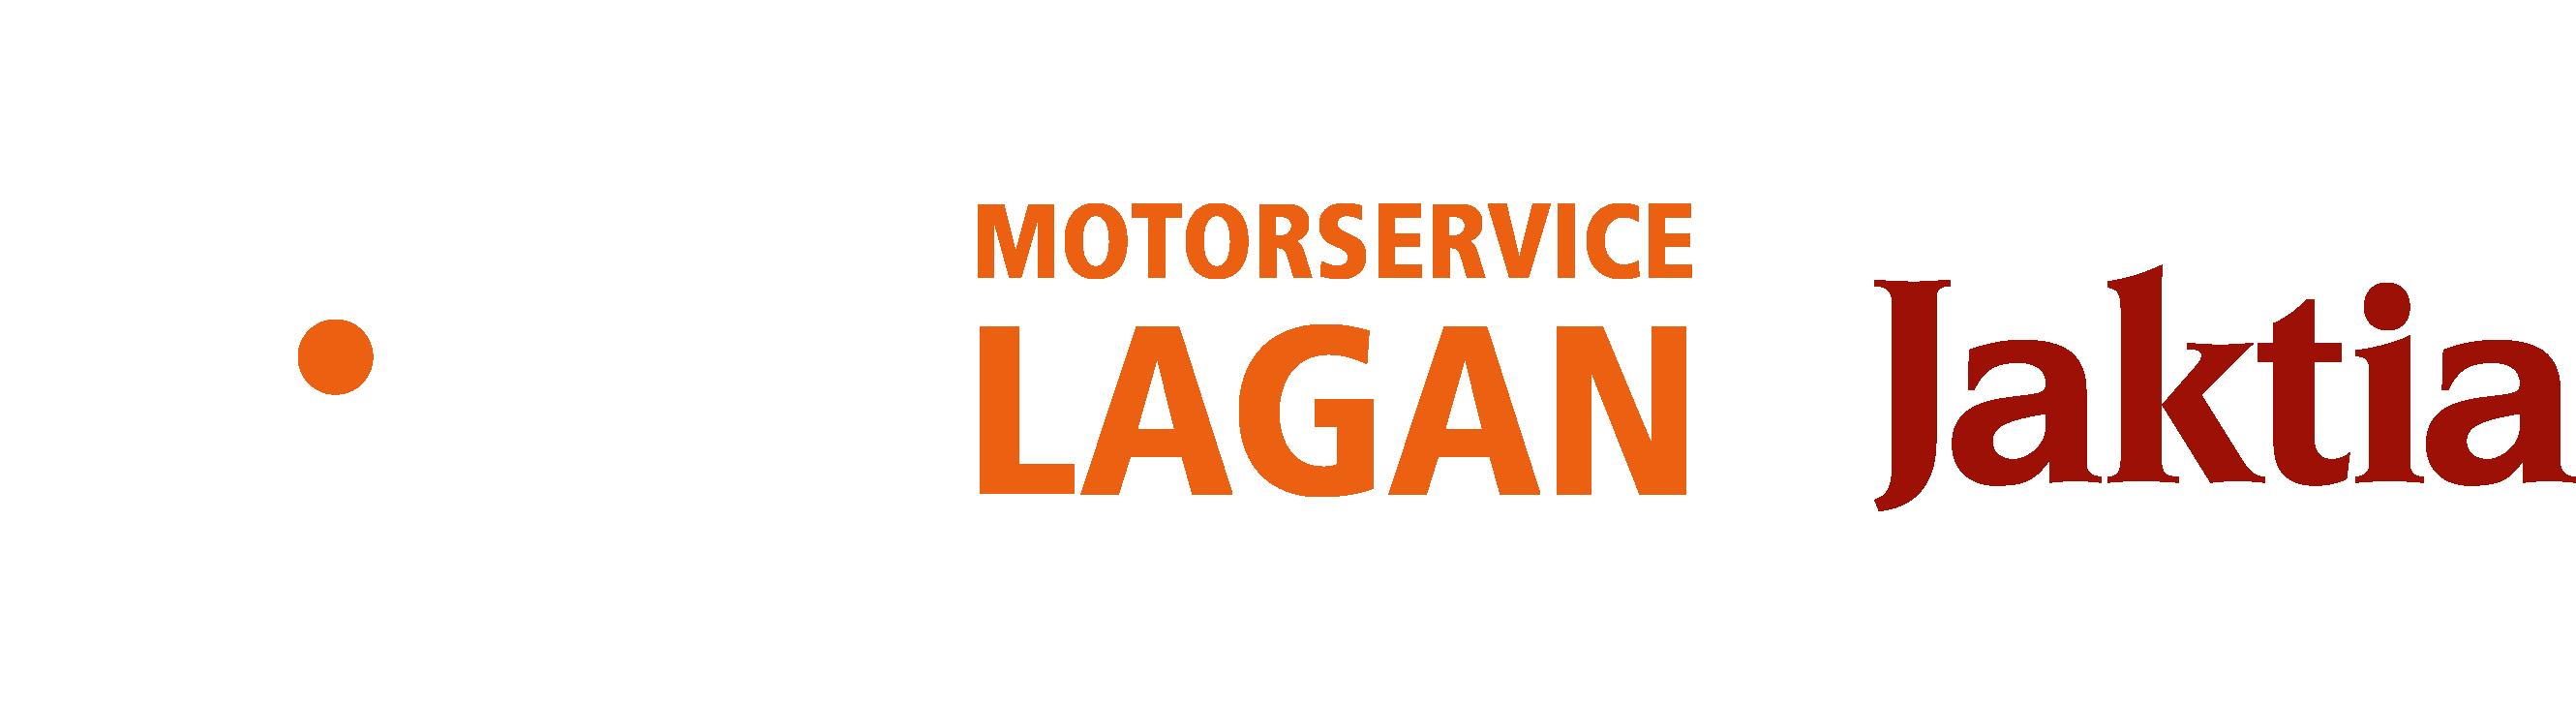 Motorservice logotyp